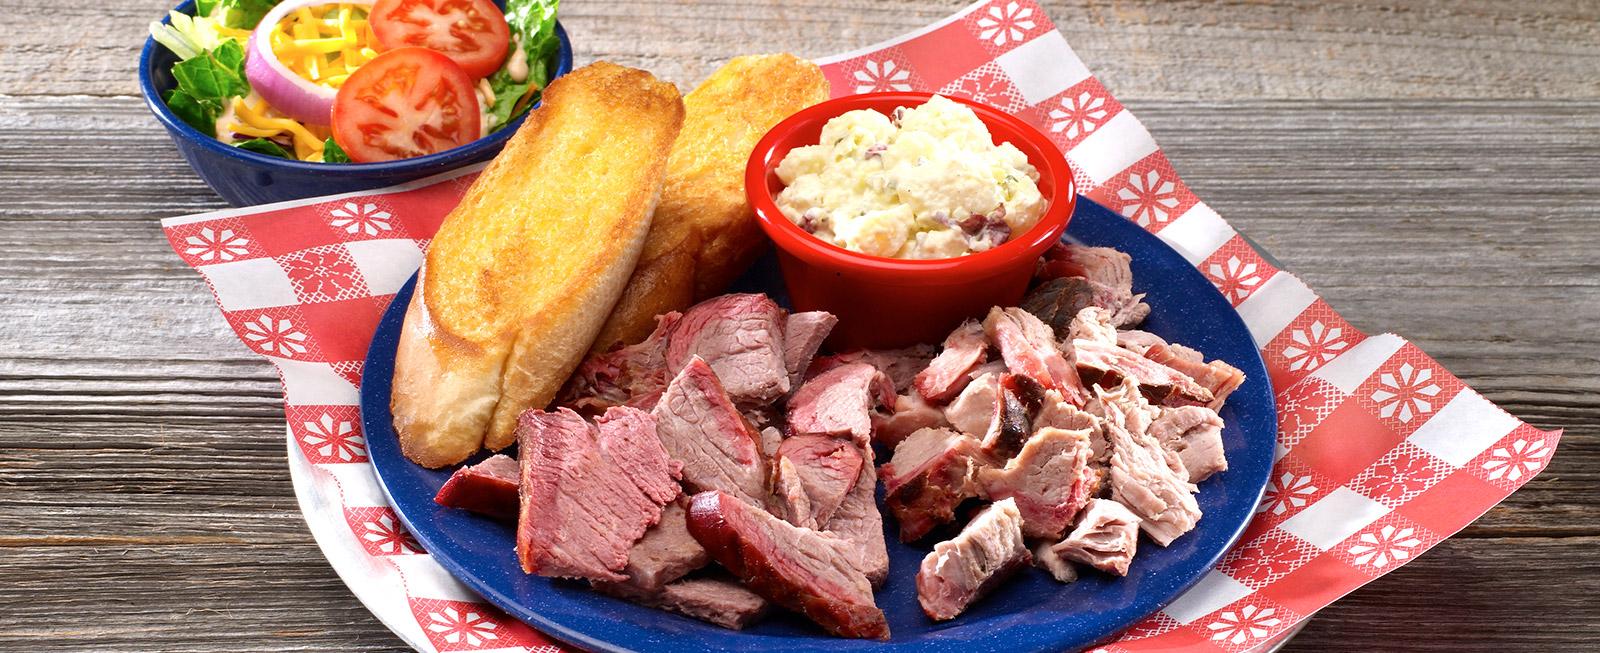 Pork & Beef Platter !